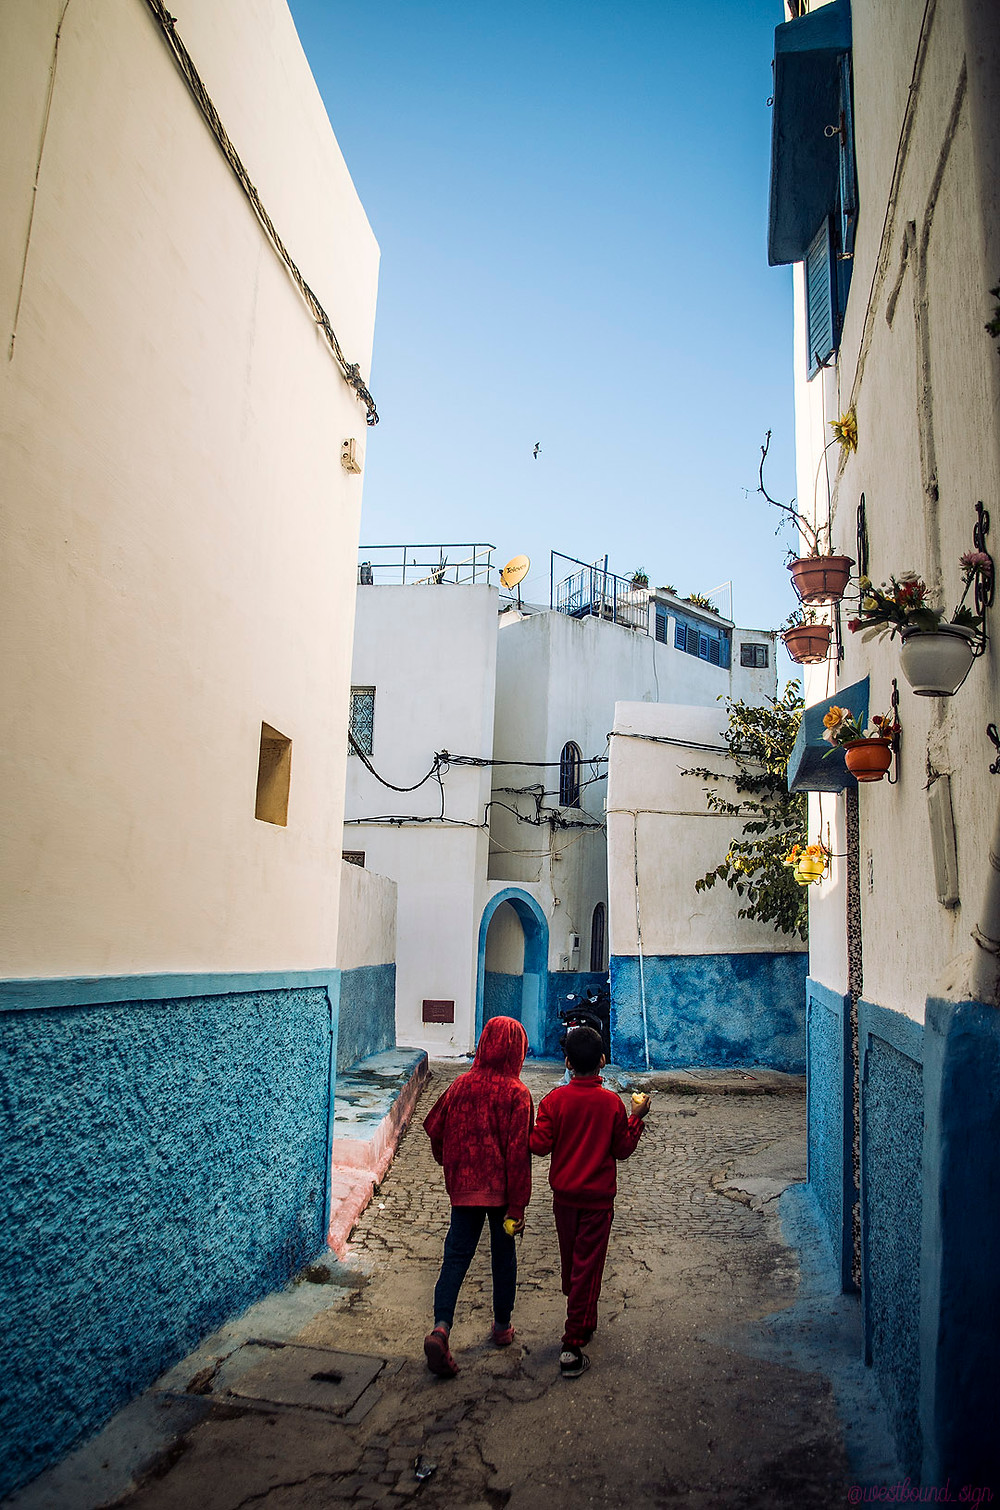 Blue Kasbah of the Udayas, Rabat, Morocco